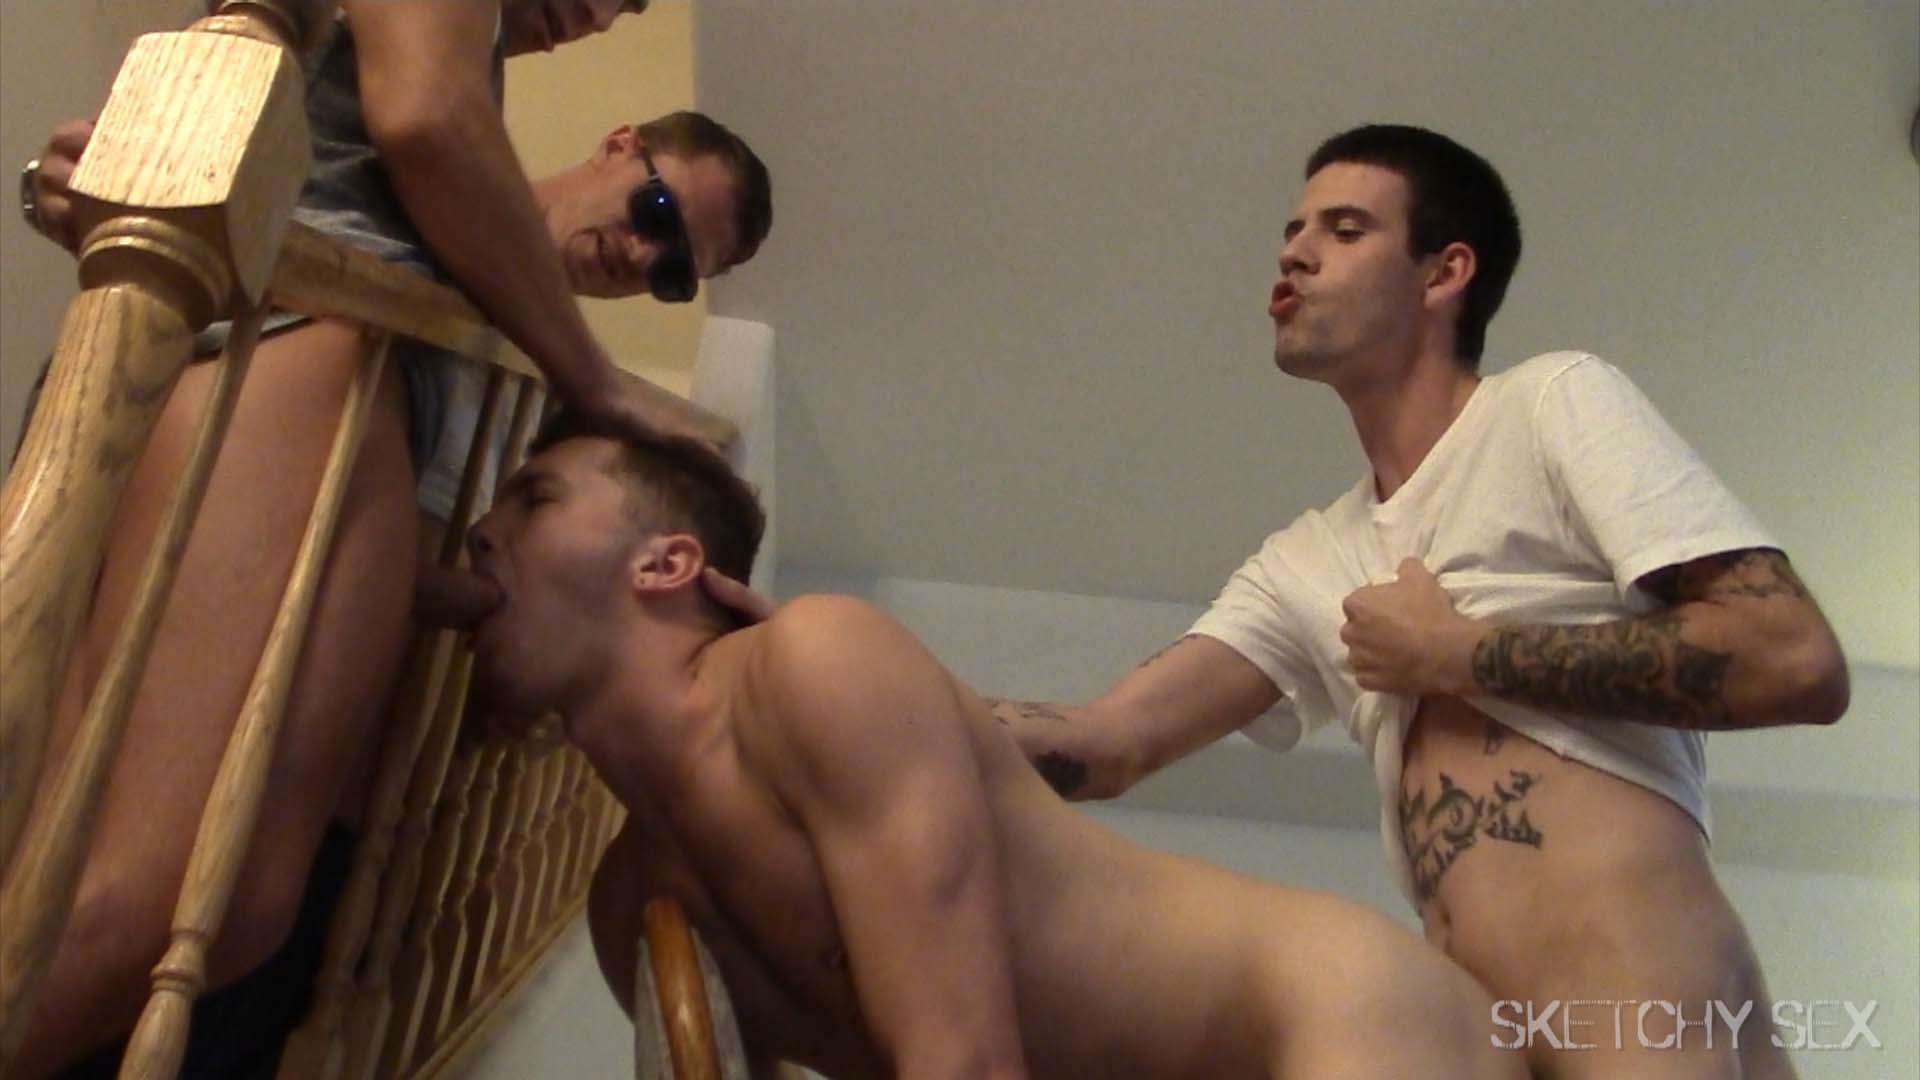 Sketchy Sex Bareback Sex Orgy Amateur Gay Porn 06 All Out Bareback Sex Buffet At The Sketchy Sex Condo